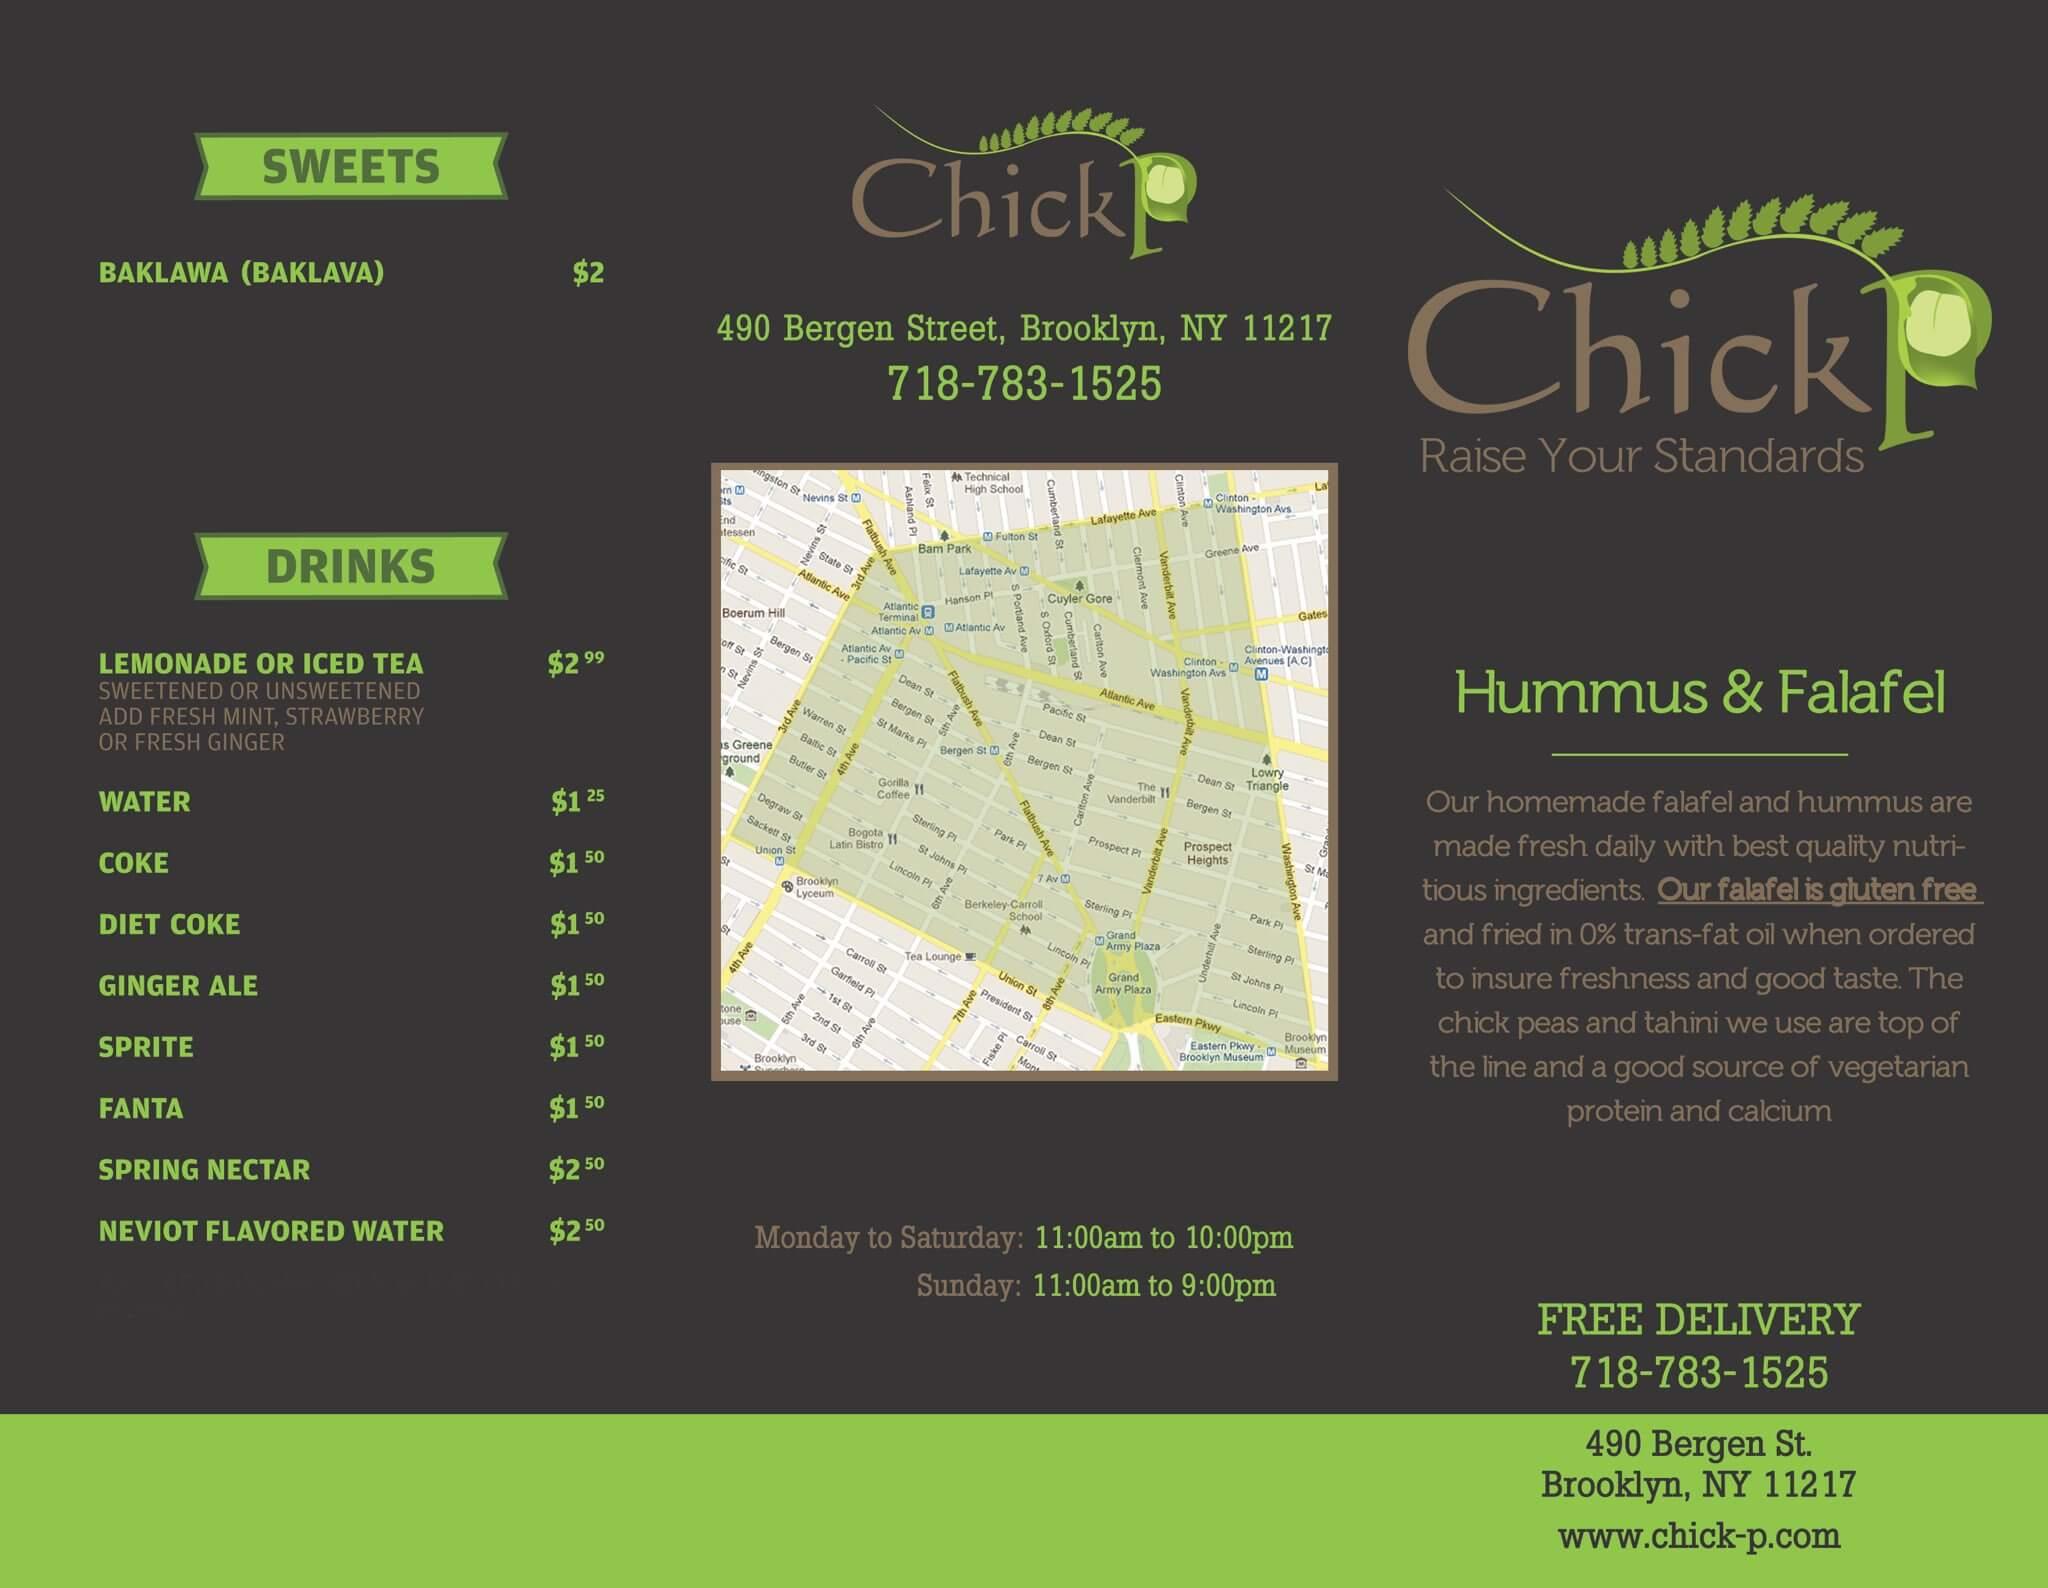 Chick P info